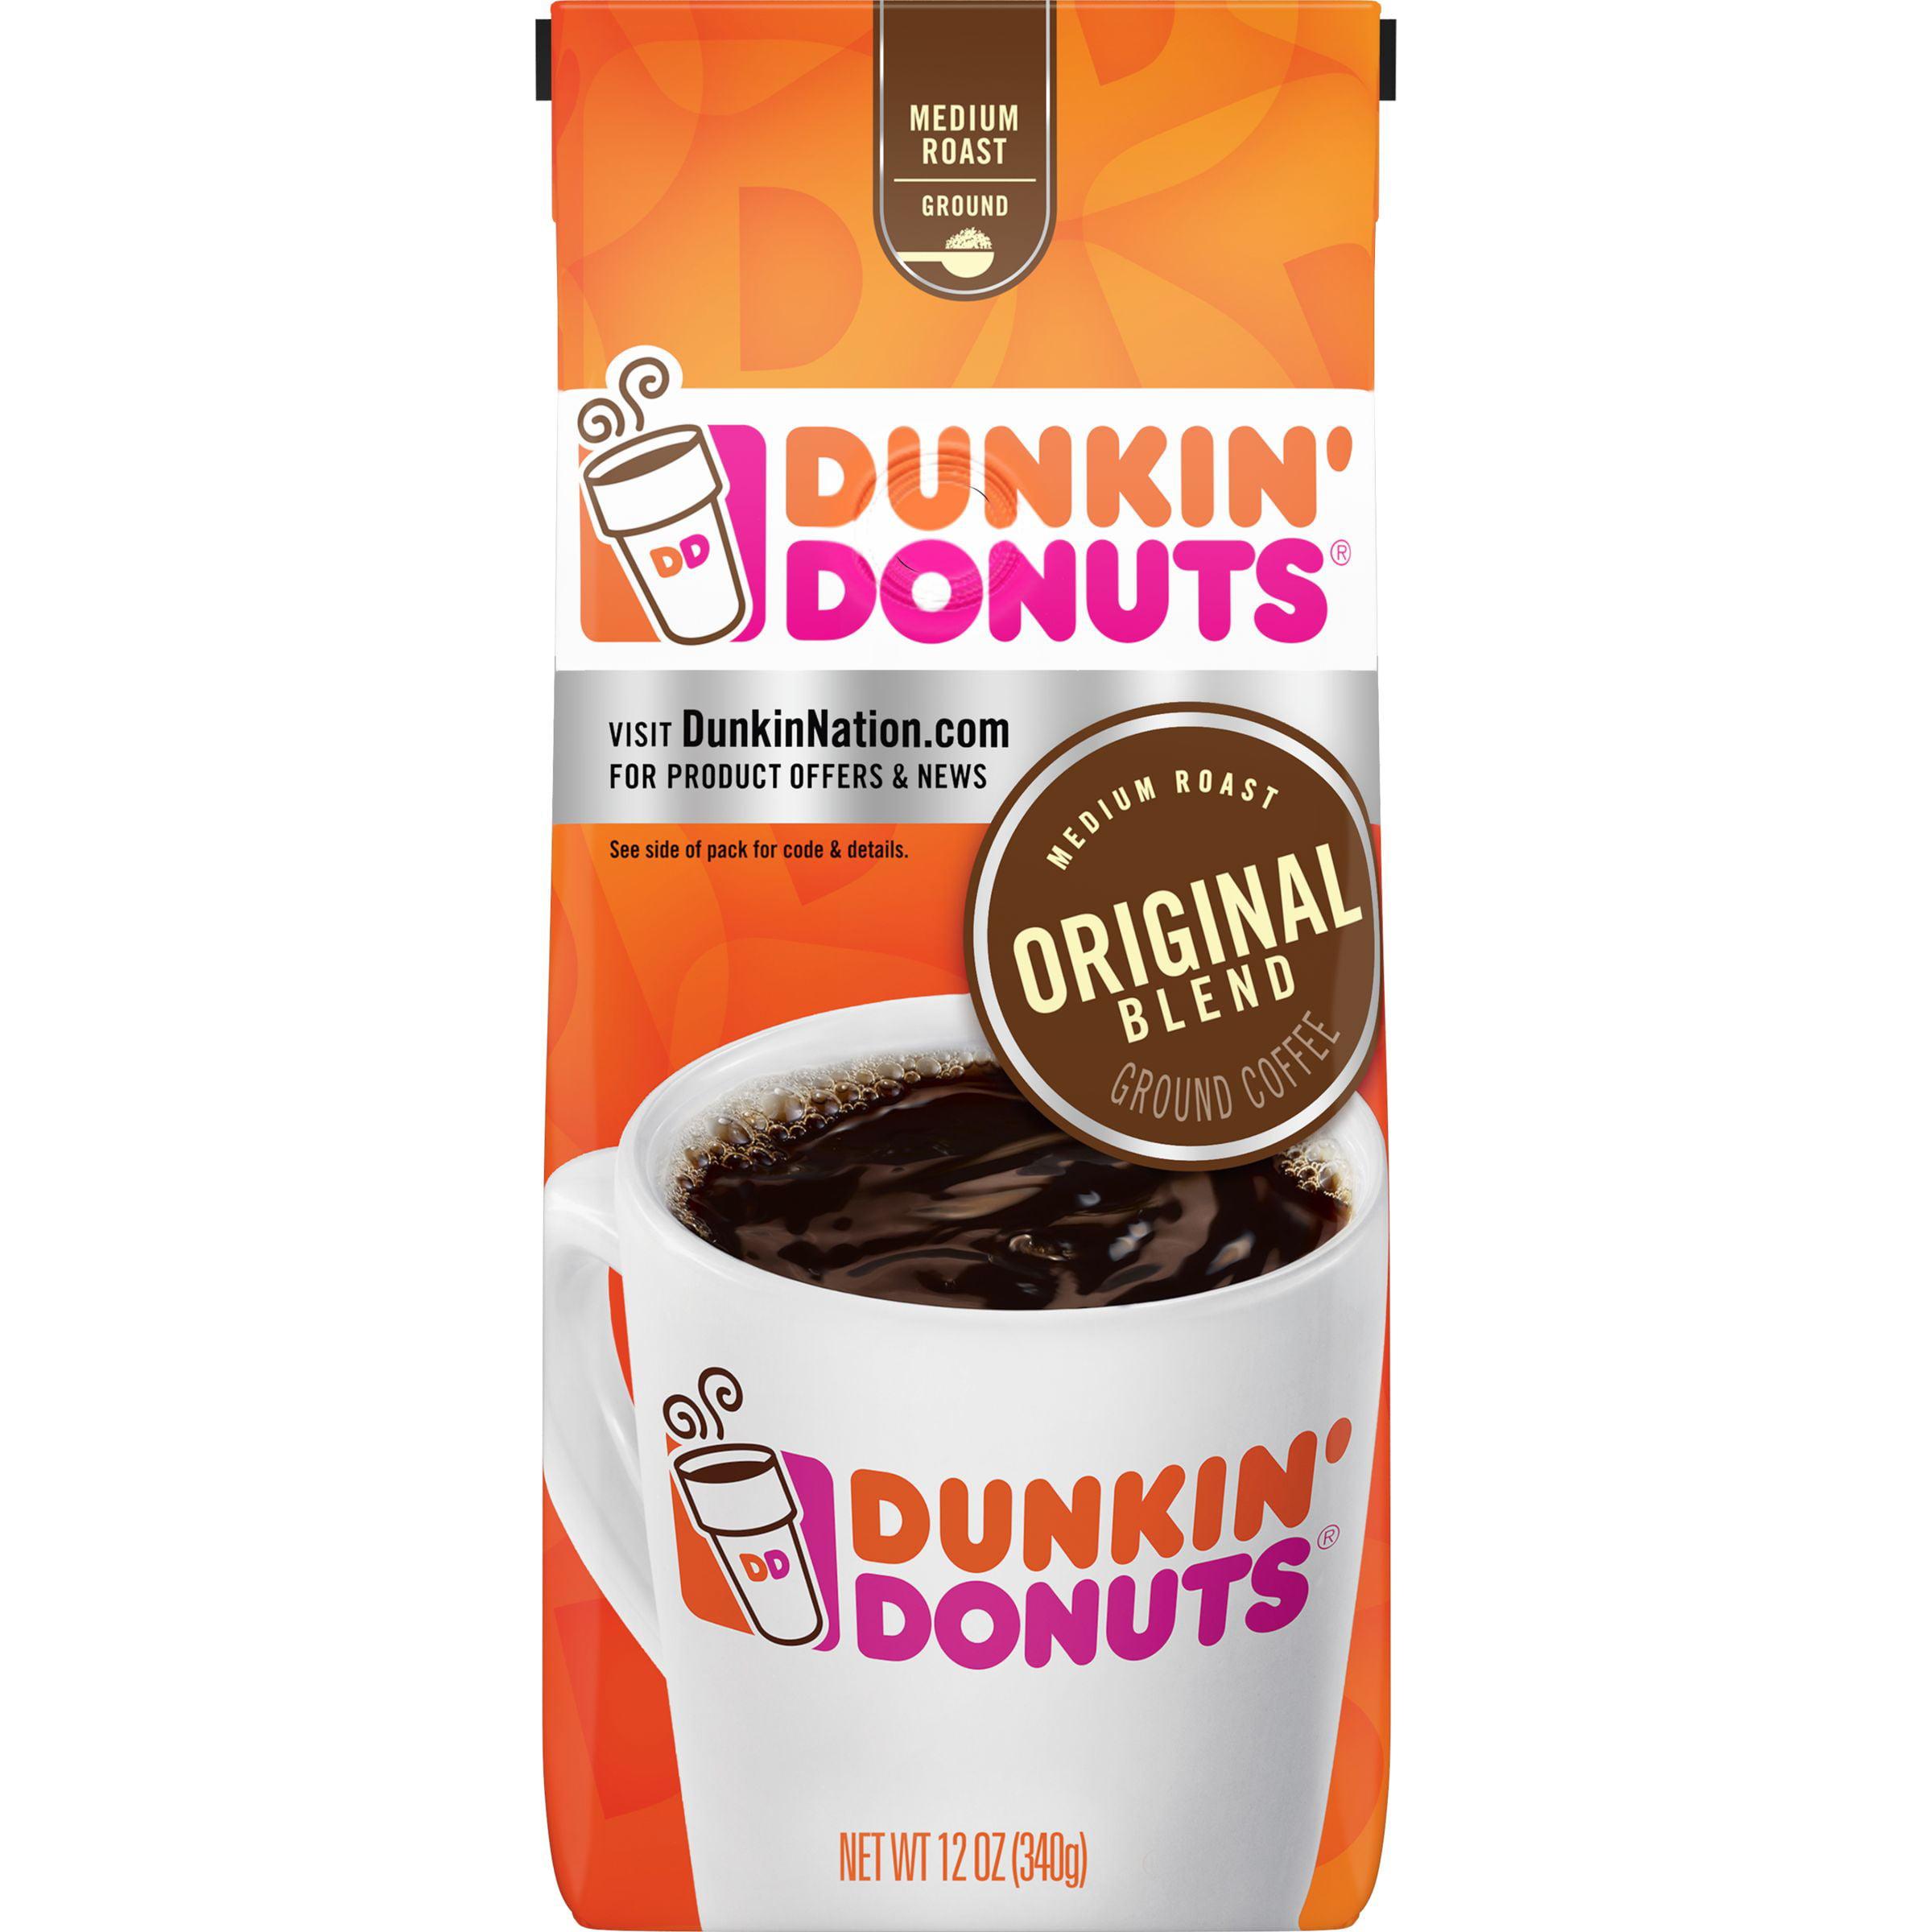 Dunkin' Donuts Original Blend Ground Coffee, Medium Roast ...